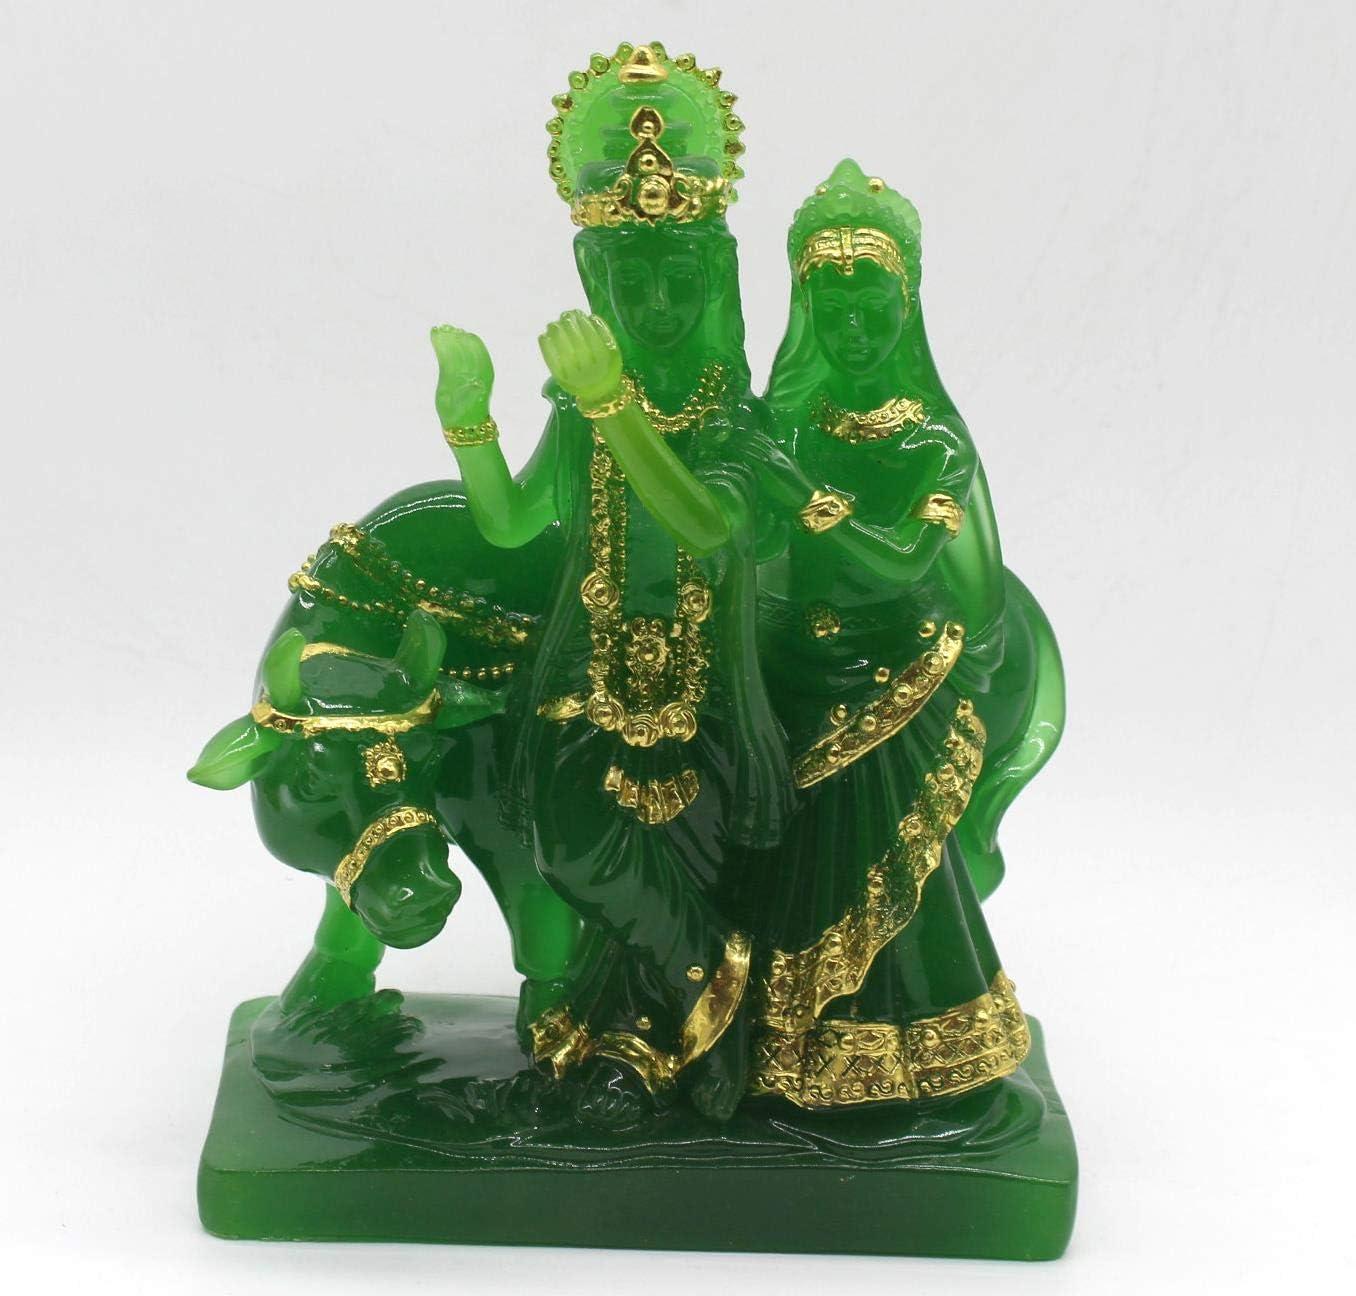 GANESH GREEN 7061 Shri Venilals GANESH GANESHA GREEN STATUE IDOL FIGURINE FOR HOME DECOR GIFT ITEM